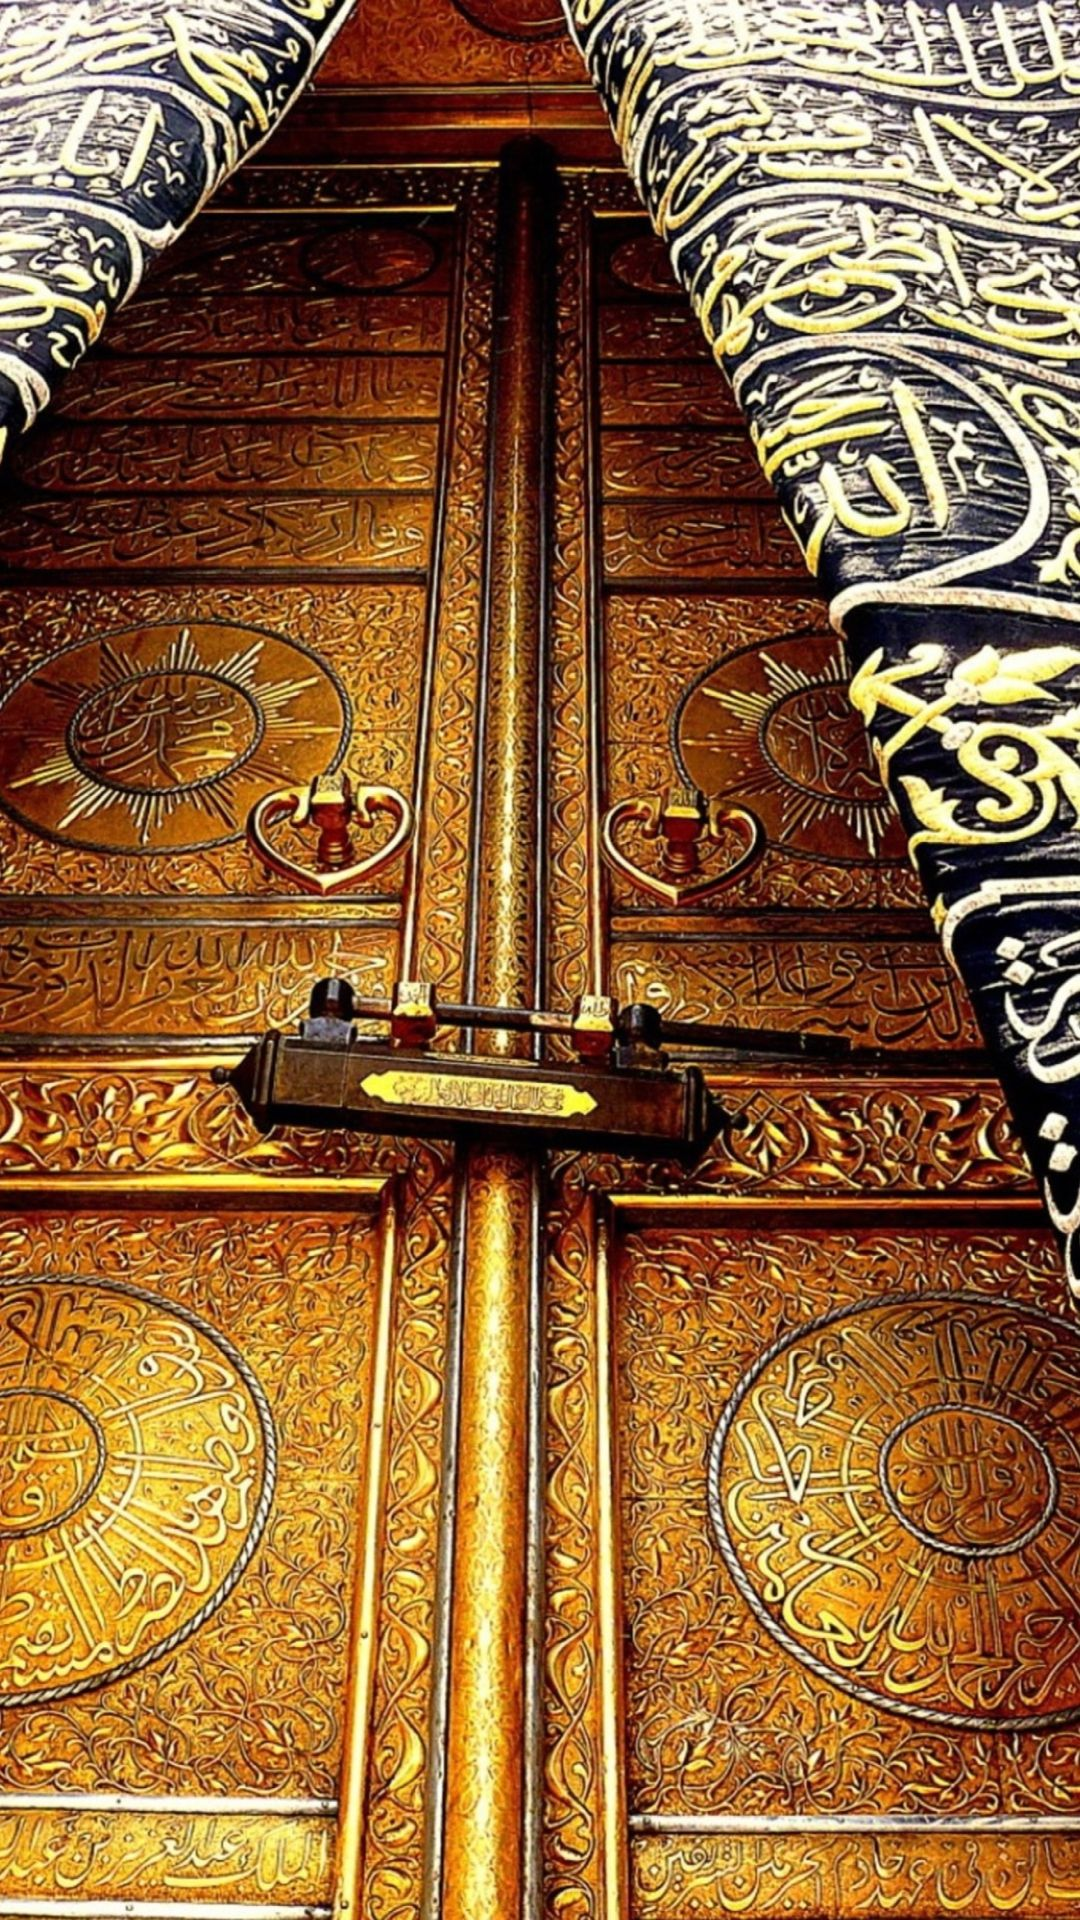 Wallpaper Islamic Gate On Phone Nokia Lumia